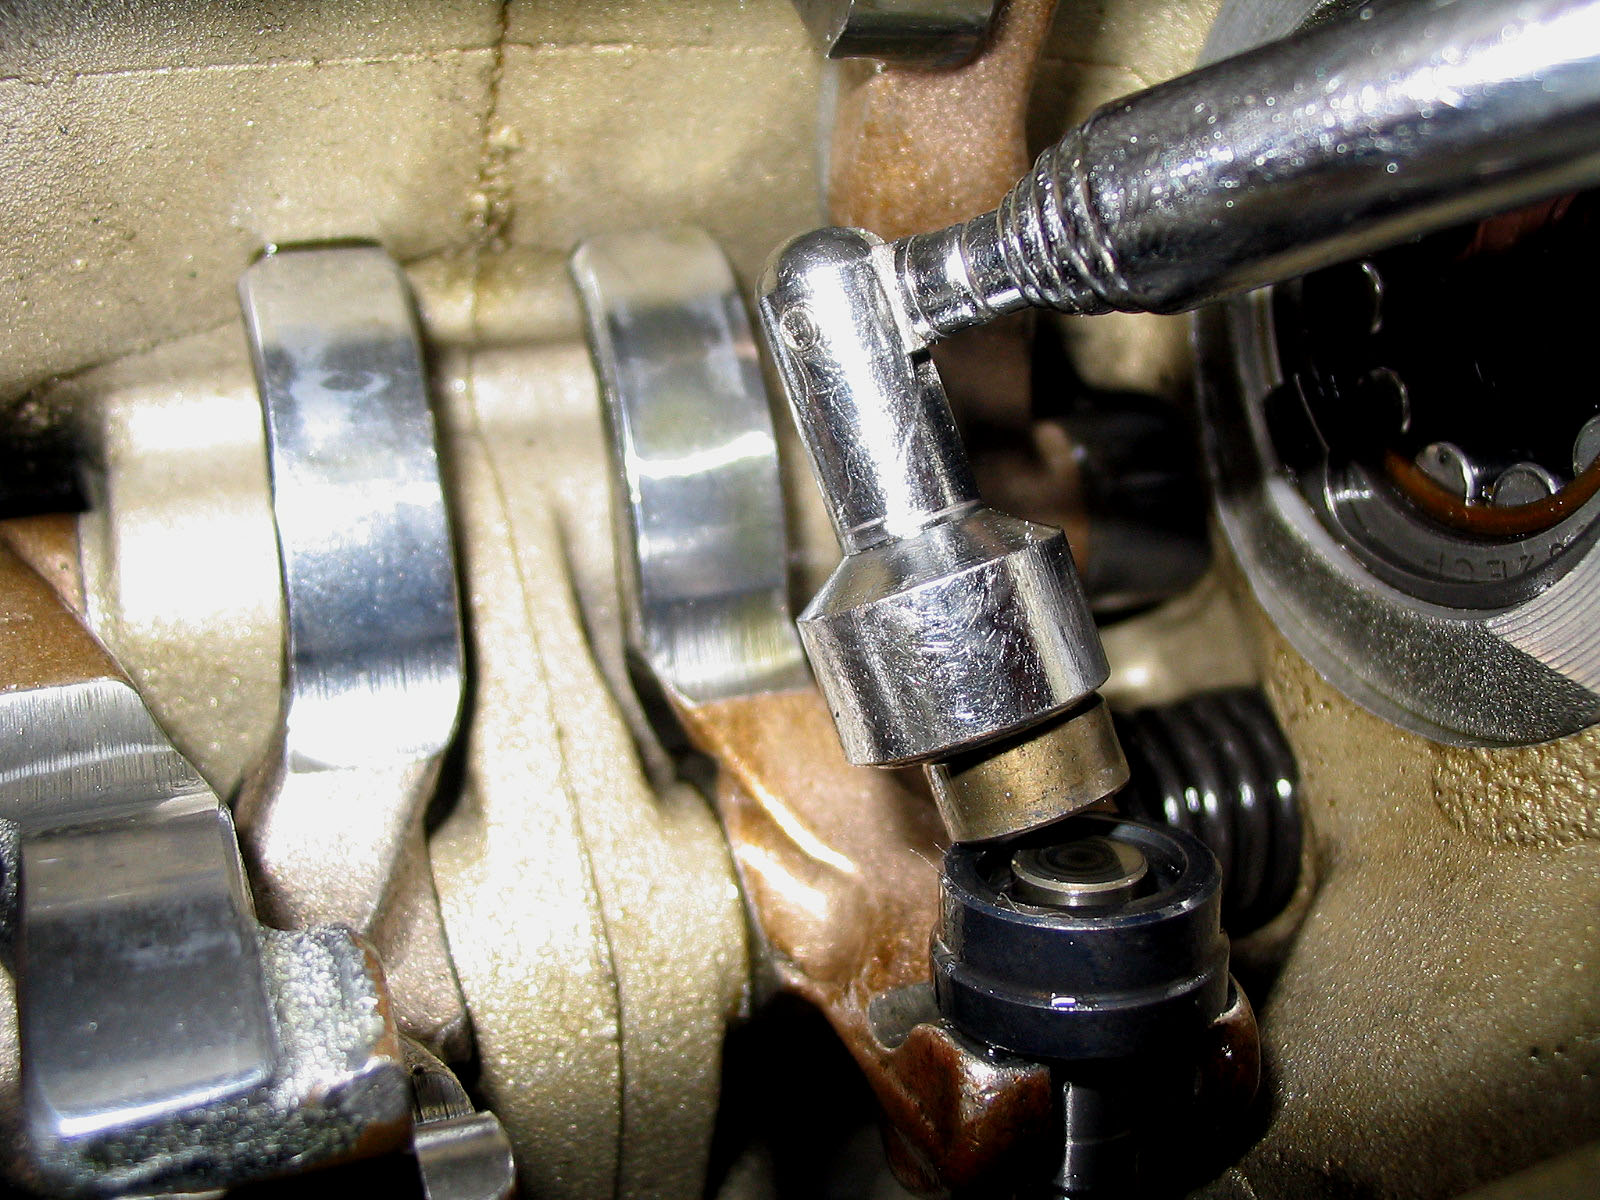 OddBike: How to Adjust Ducati Desmo Valves